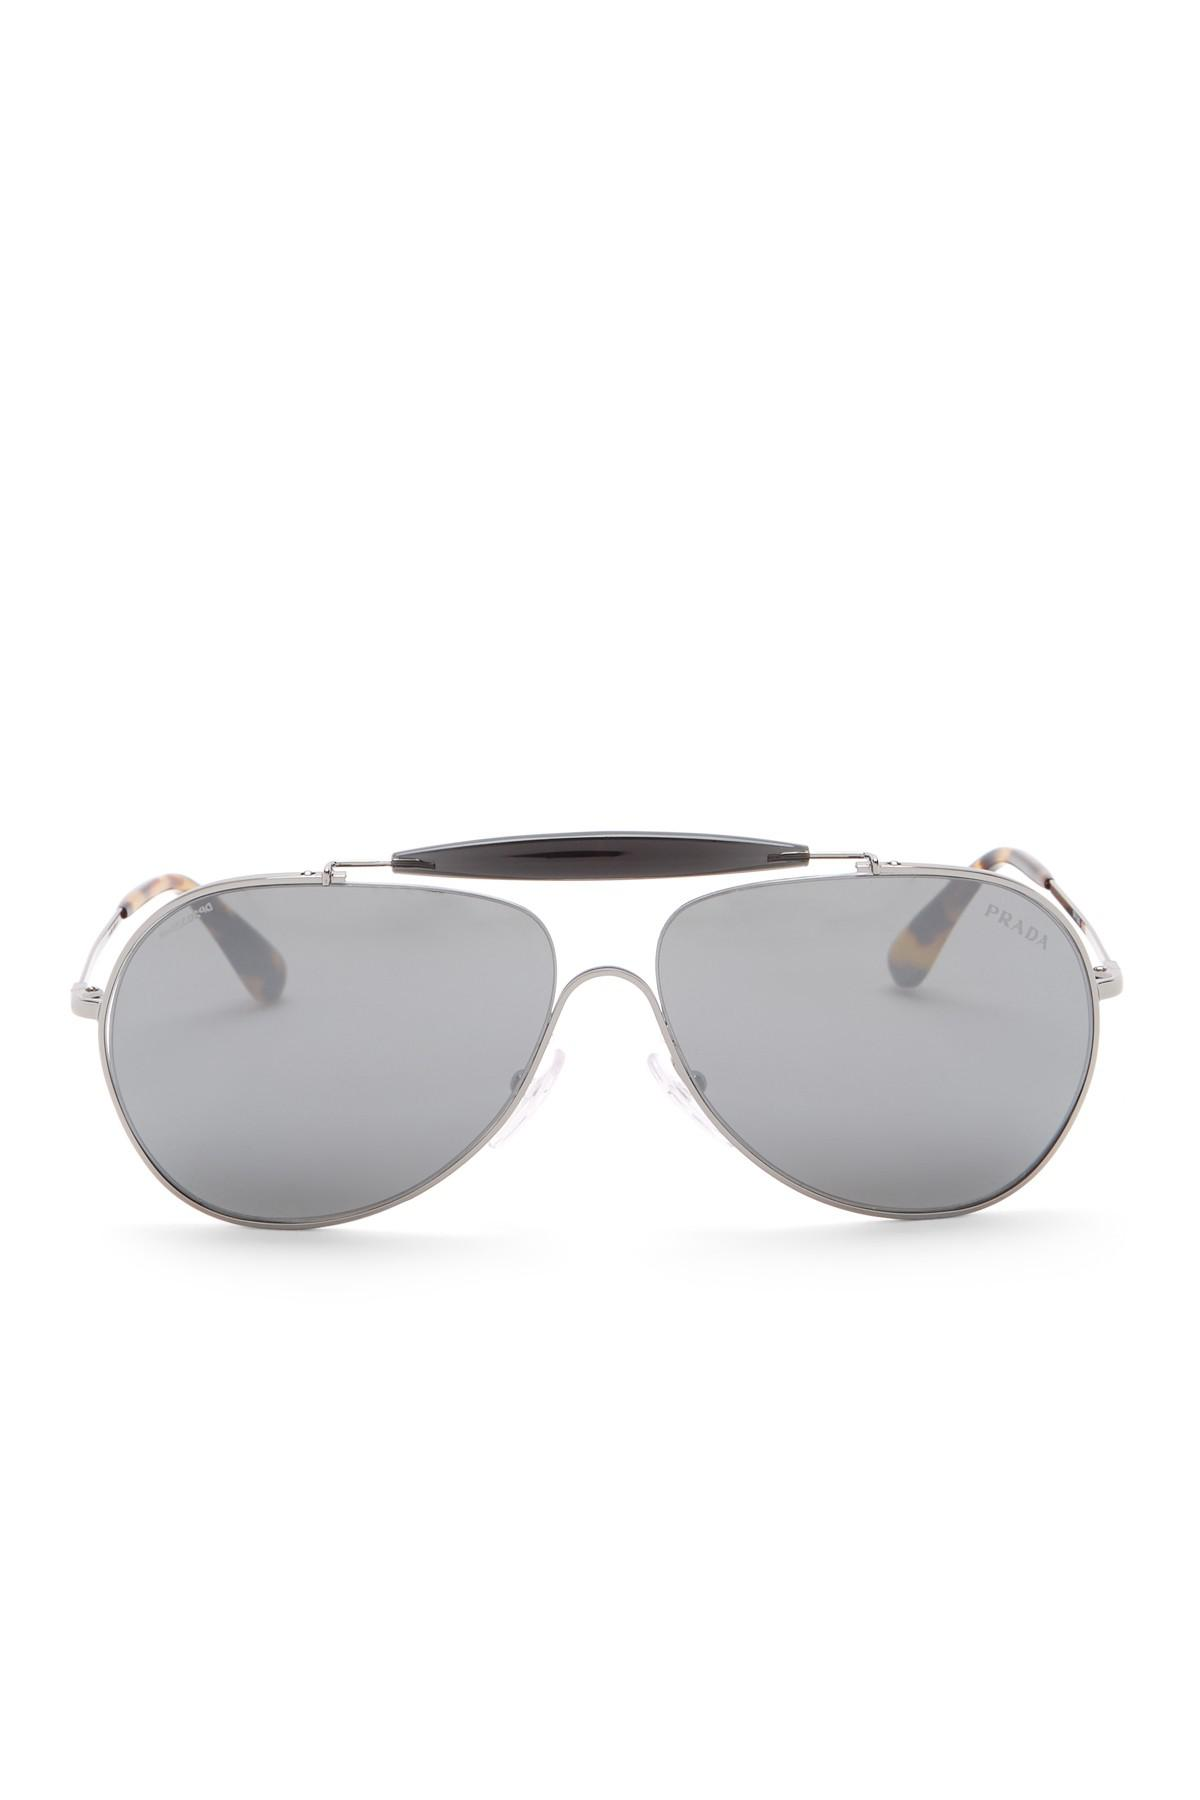 f90a06a049b4 Prada - Metallic 59mm Aviator Sunglasses for Men - Lyst. View fullscreen